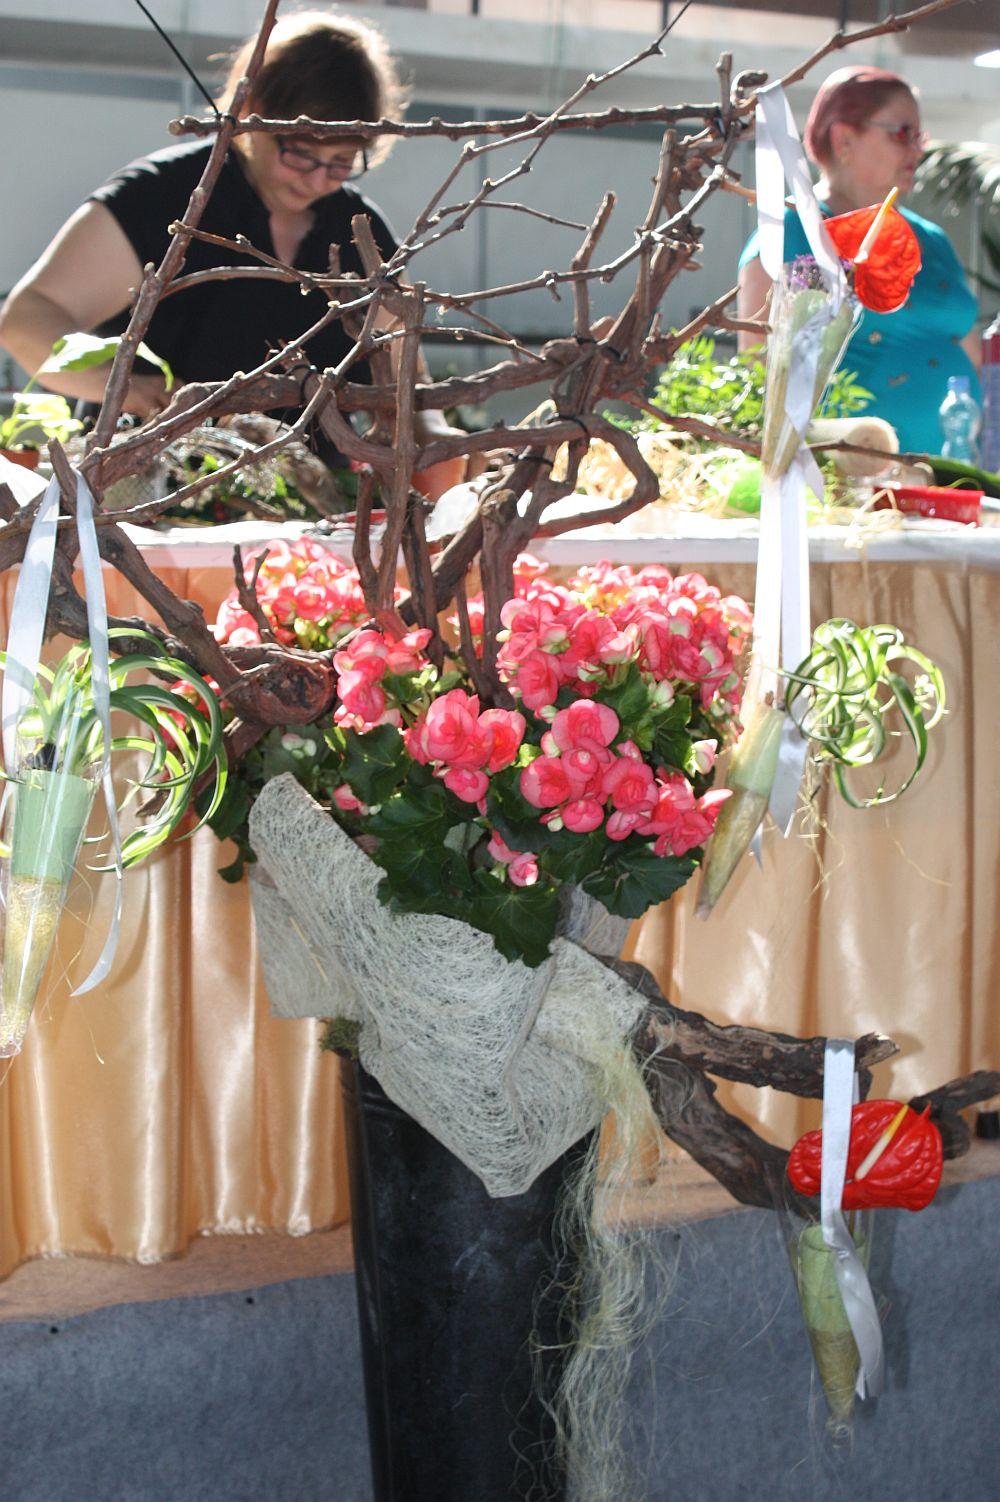 adelaparvu.com despre targul de plante, flori si peisagistica Hartus Florshow 2014 (8)